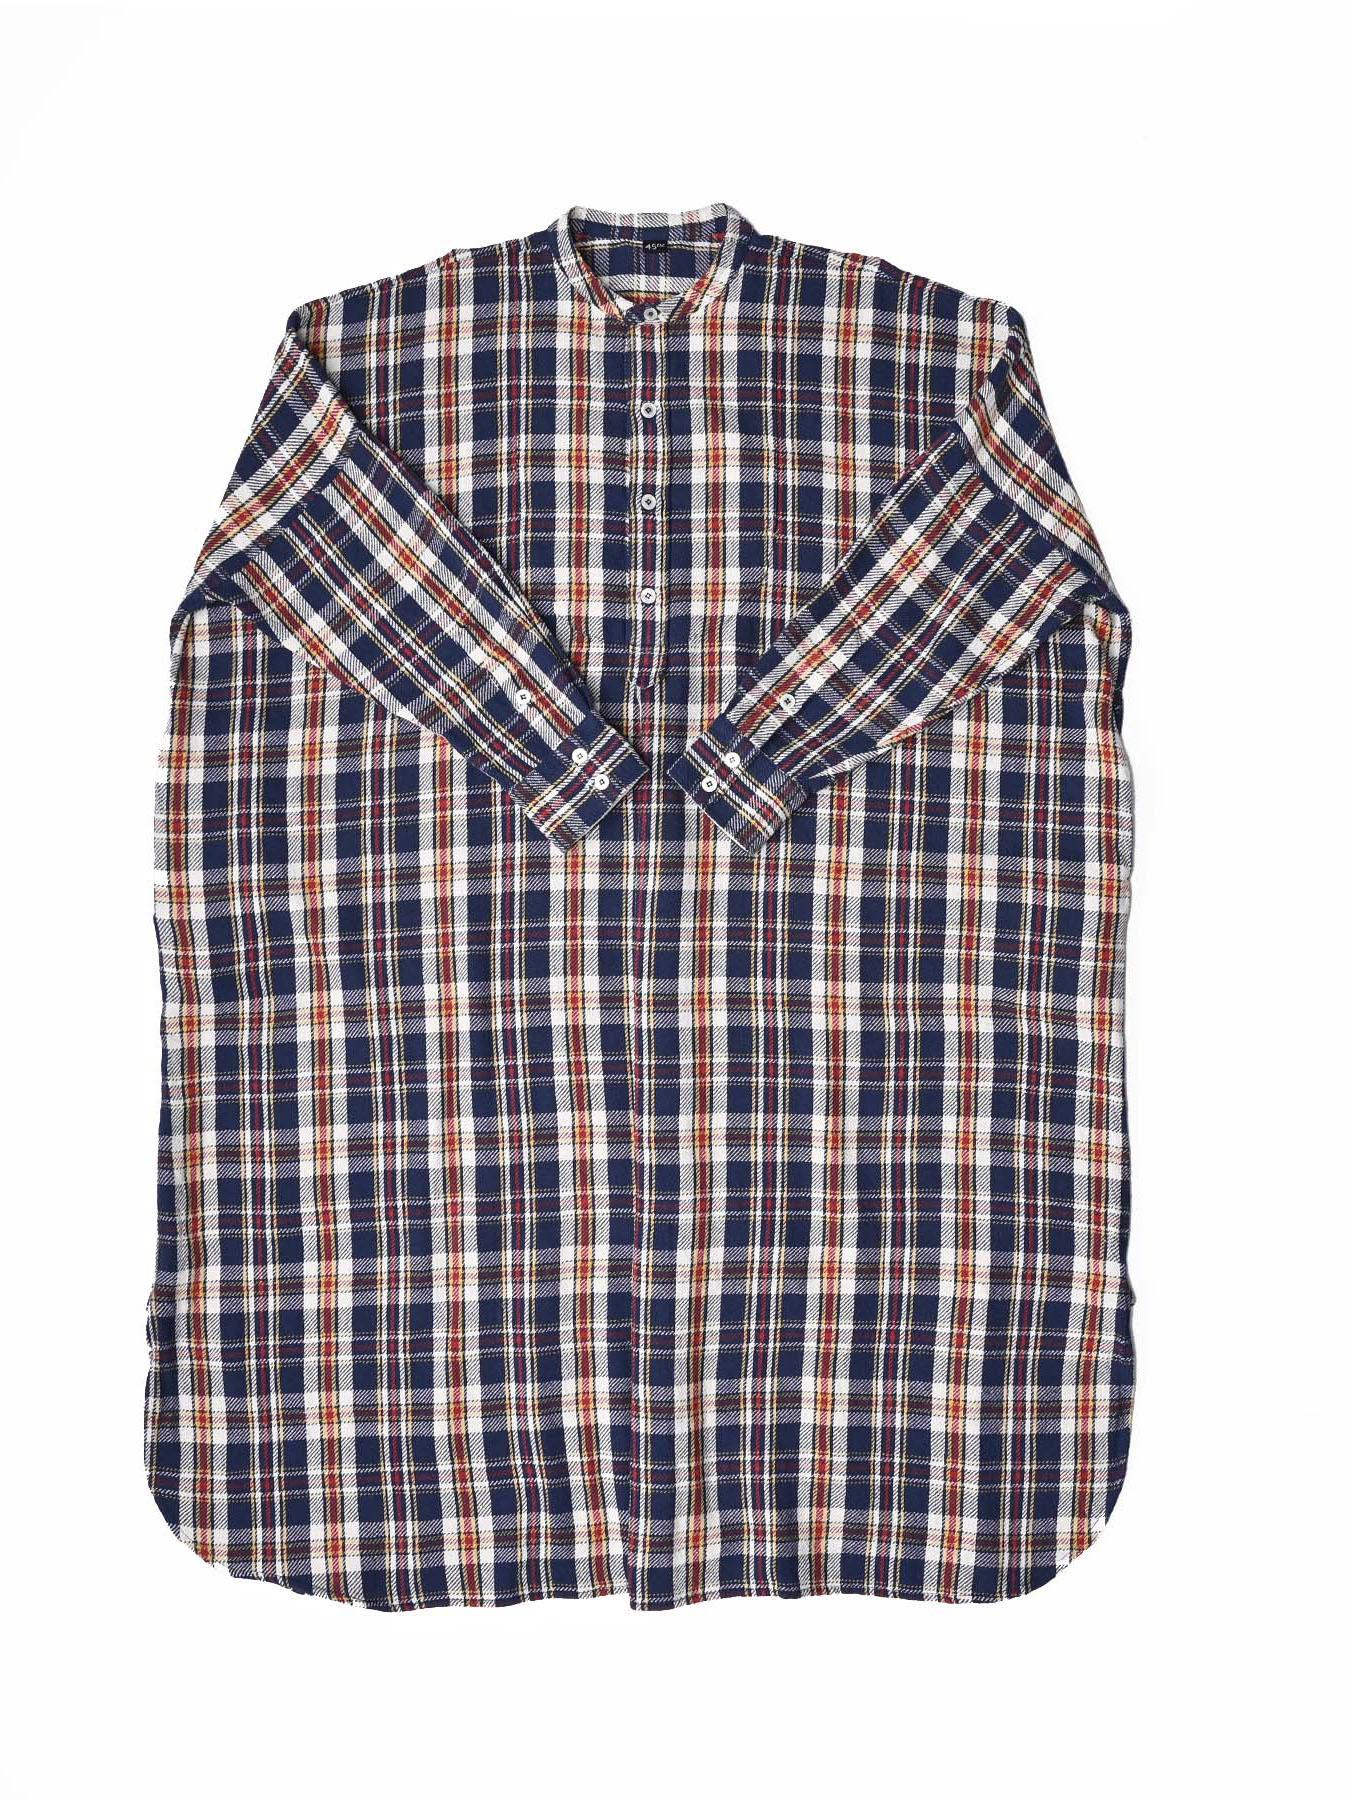 Indian Flannel Big Shirt-dress-1